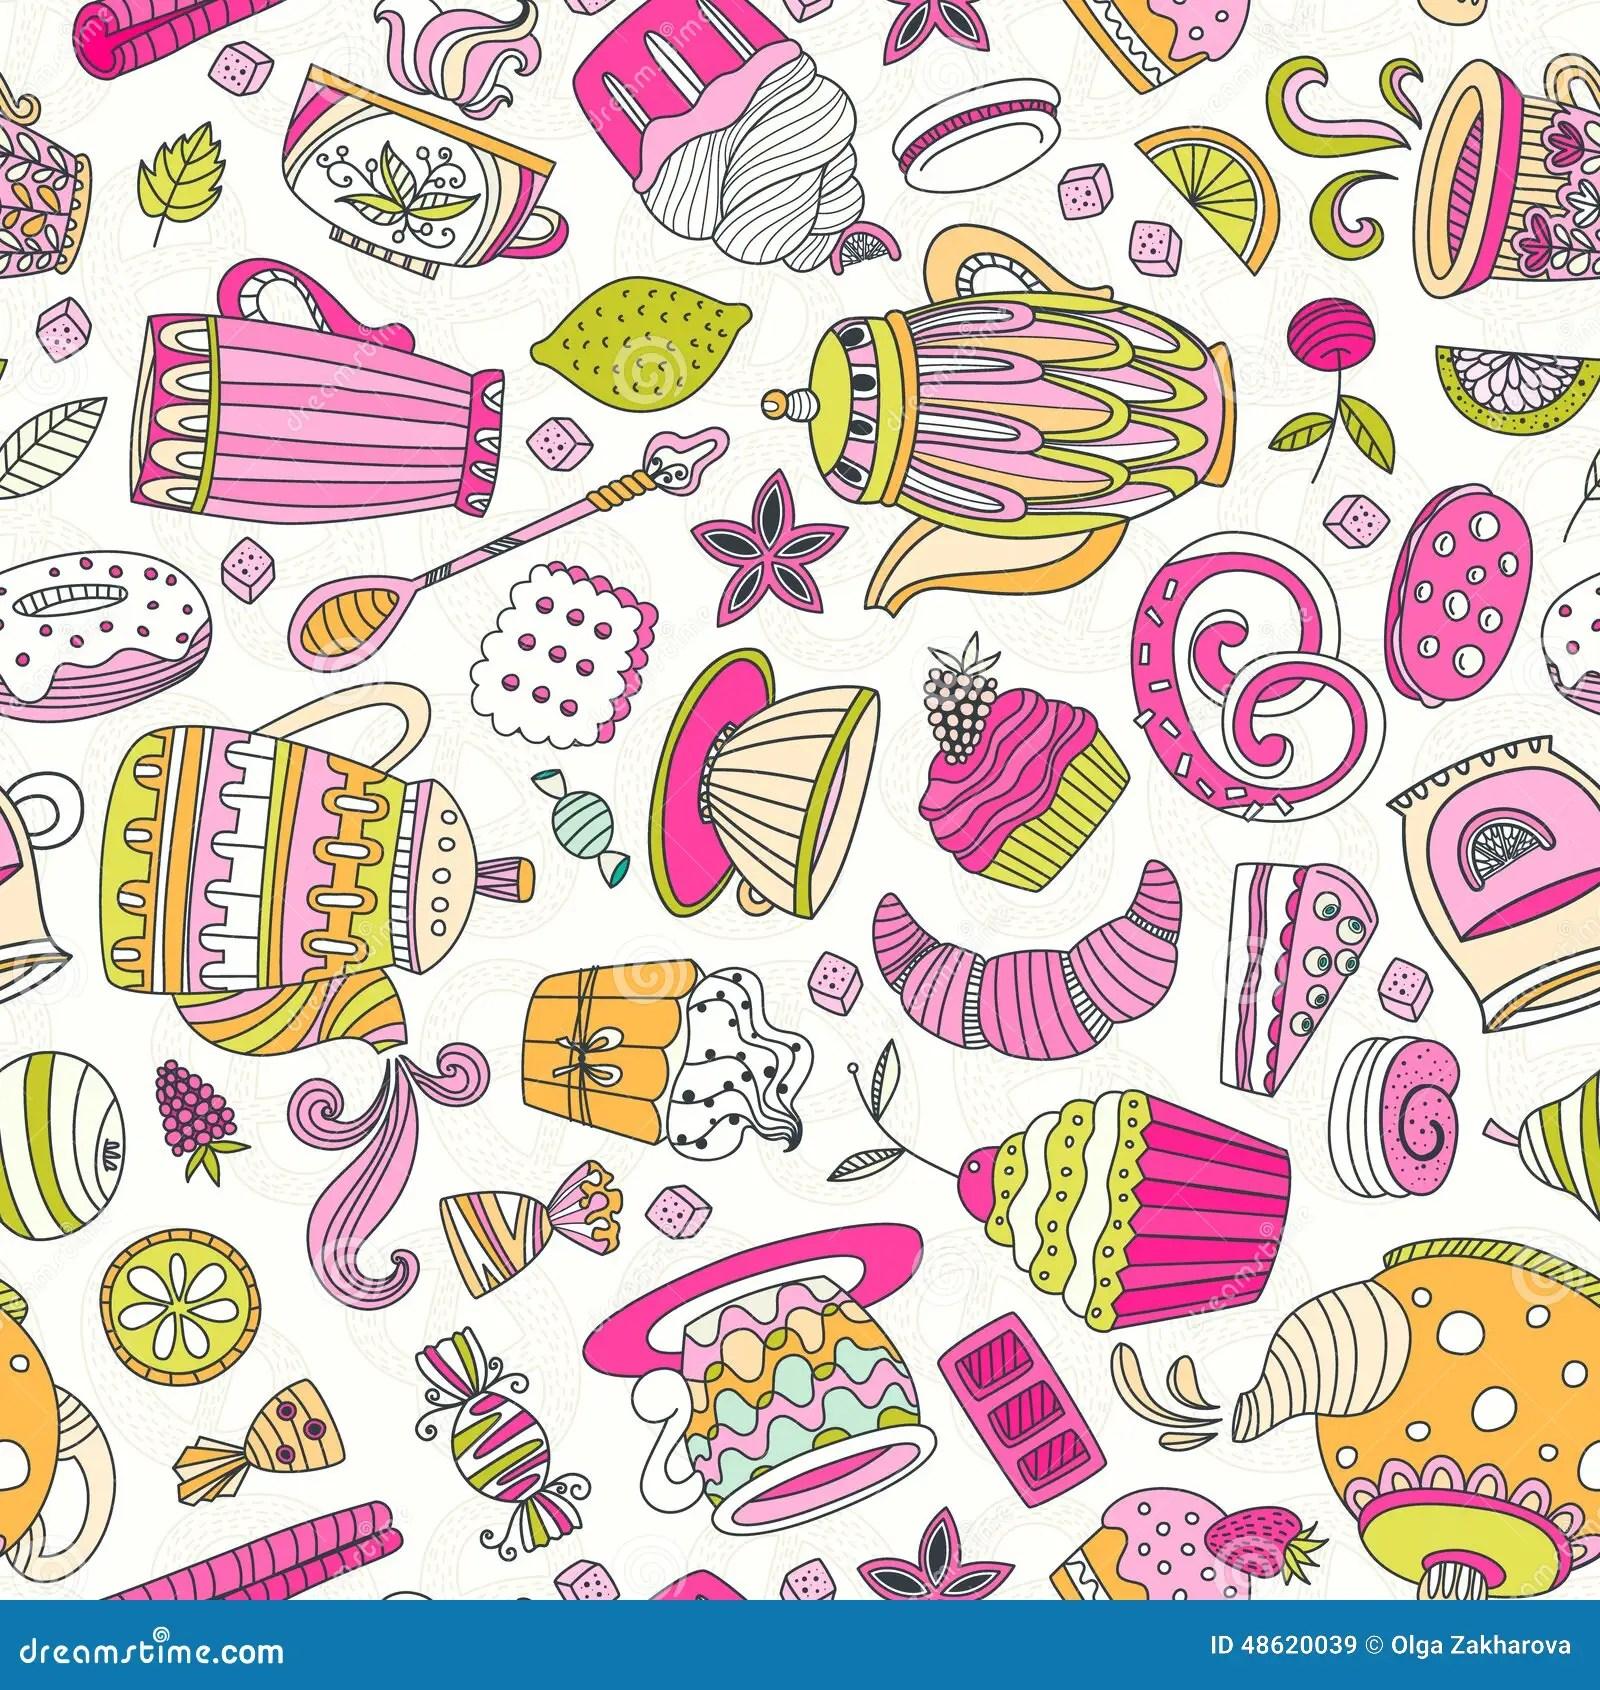 Starbucks Wallpaper Cute Dessert Seamless Pattern Stock Vector Image 48620039